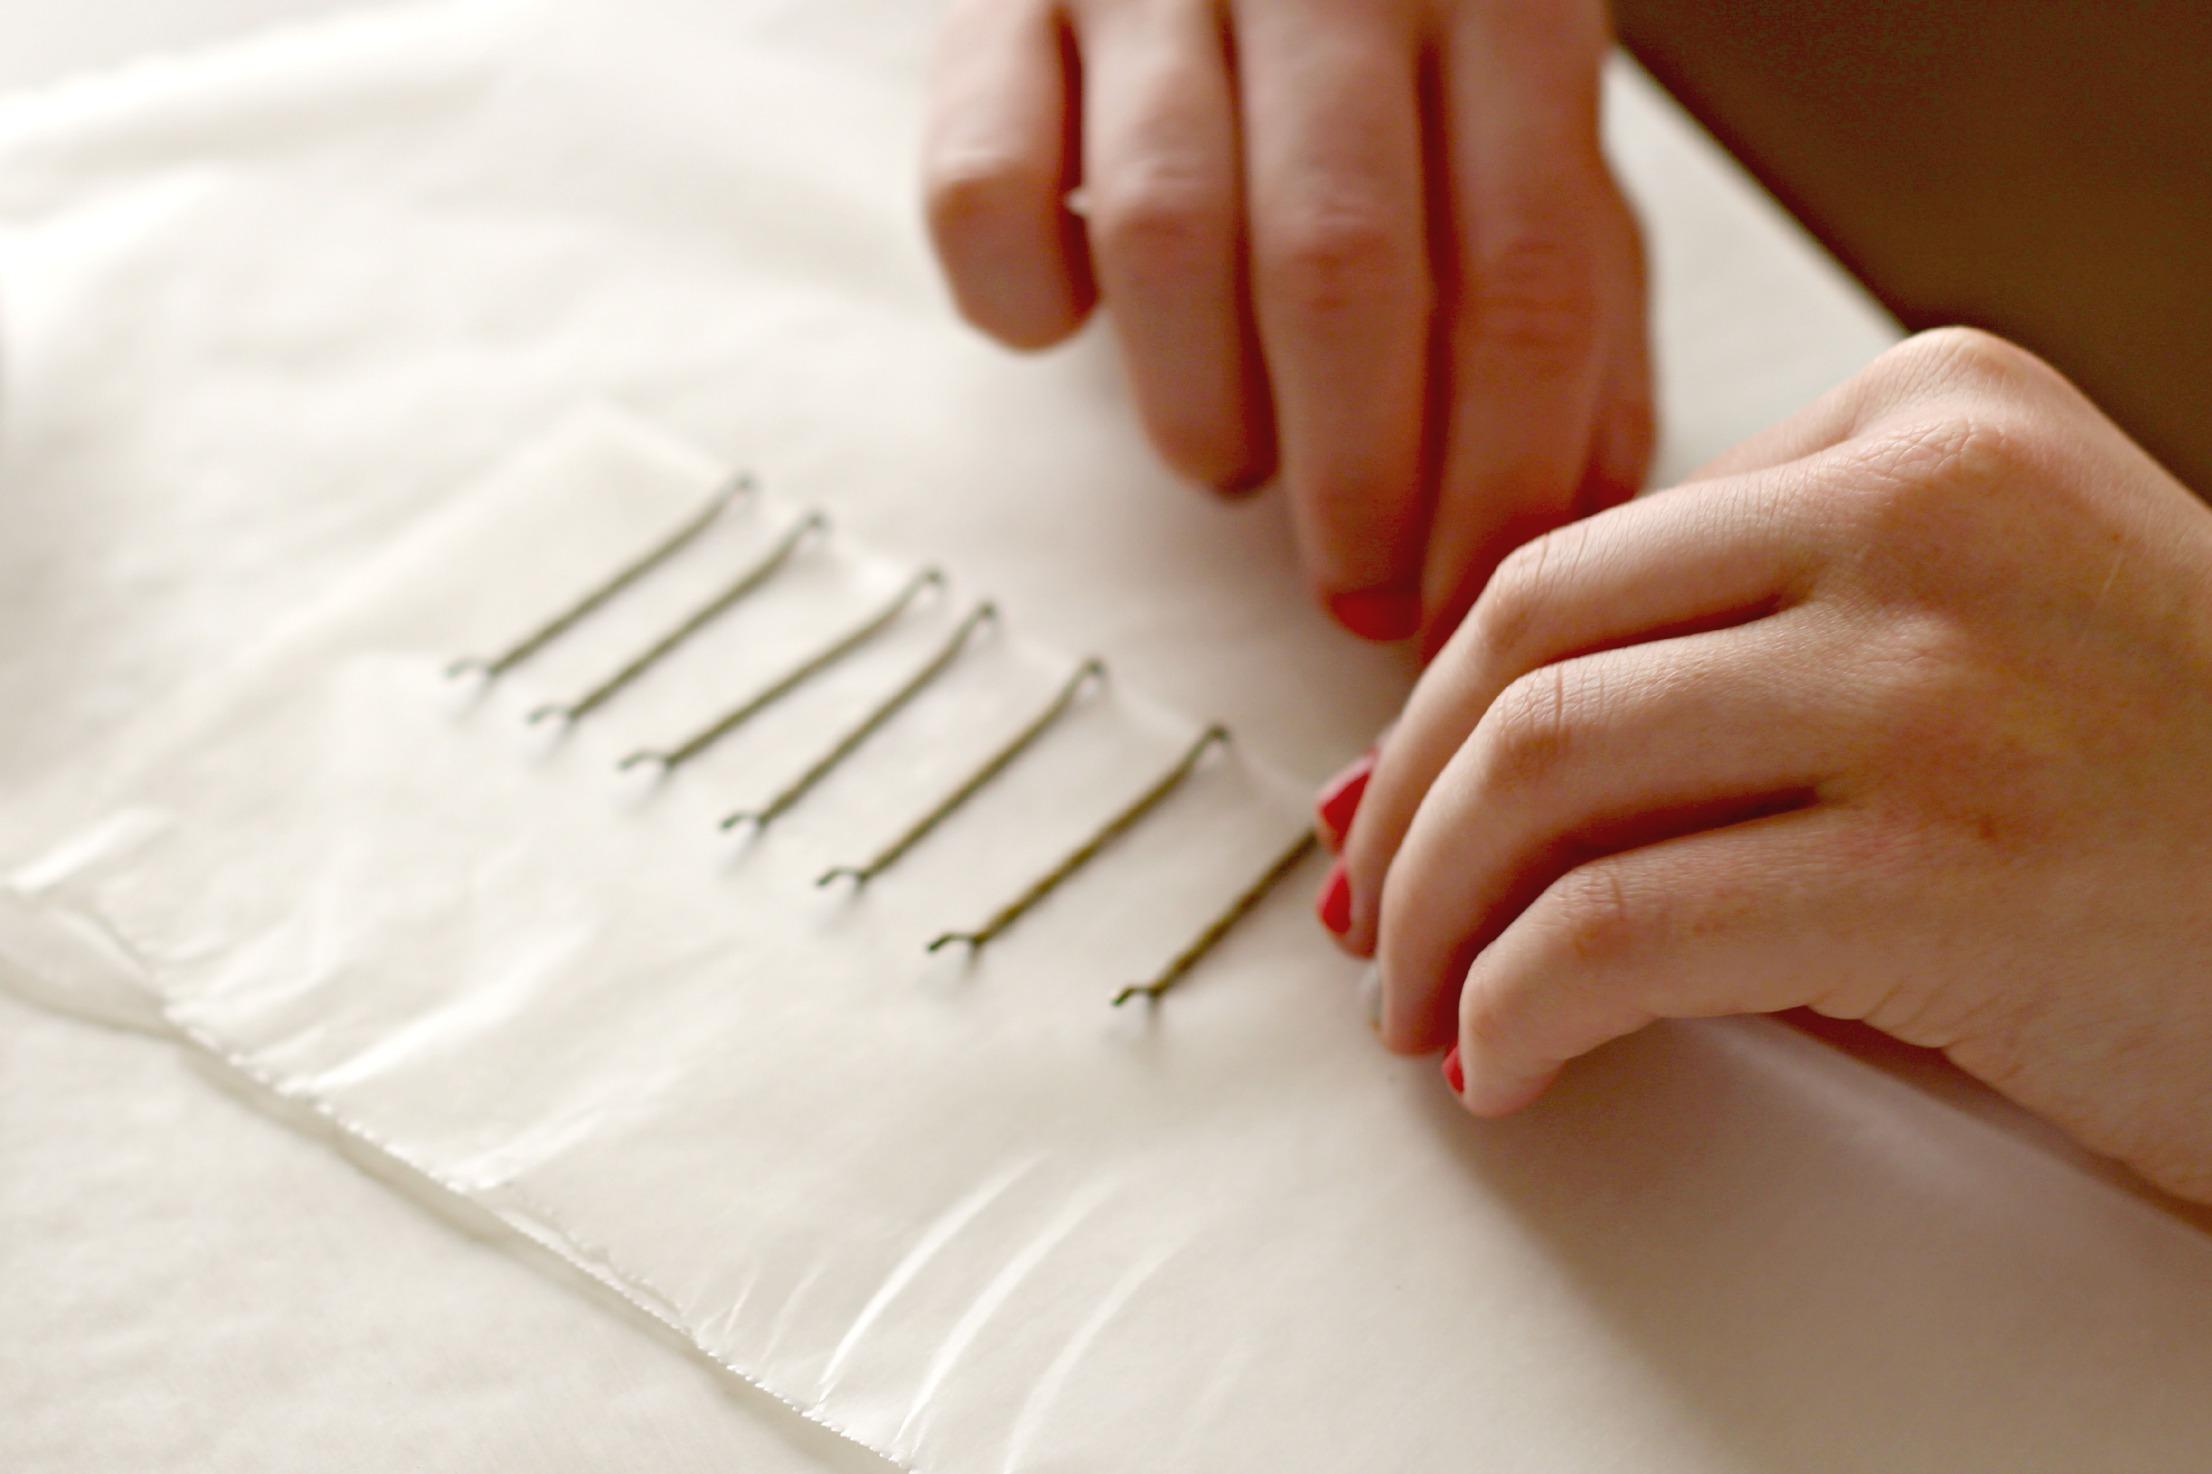 Emilee likes    Nail Polish Painted Hair Pins - Organize and